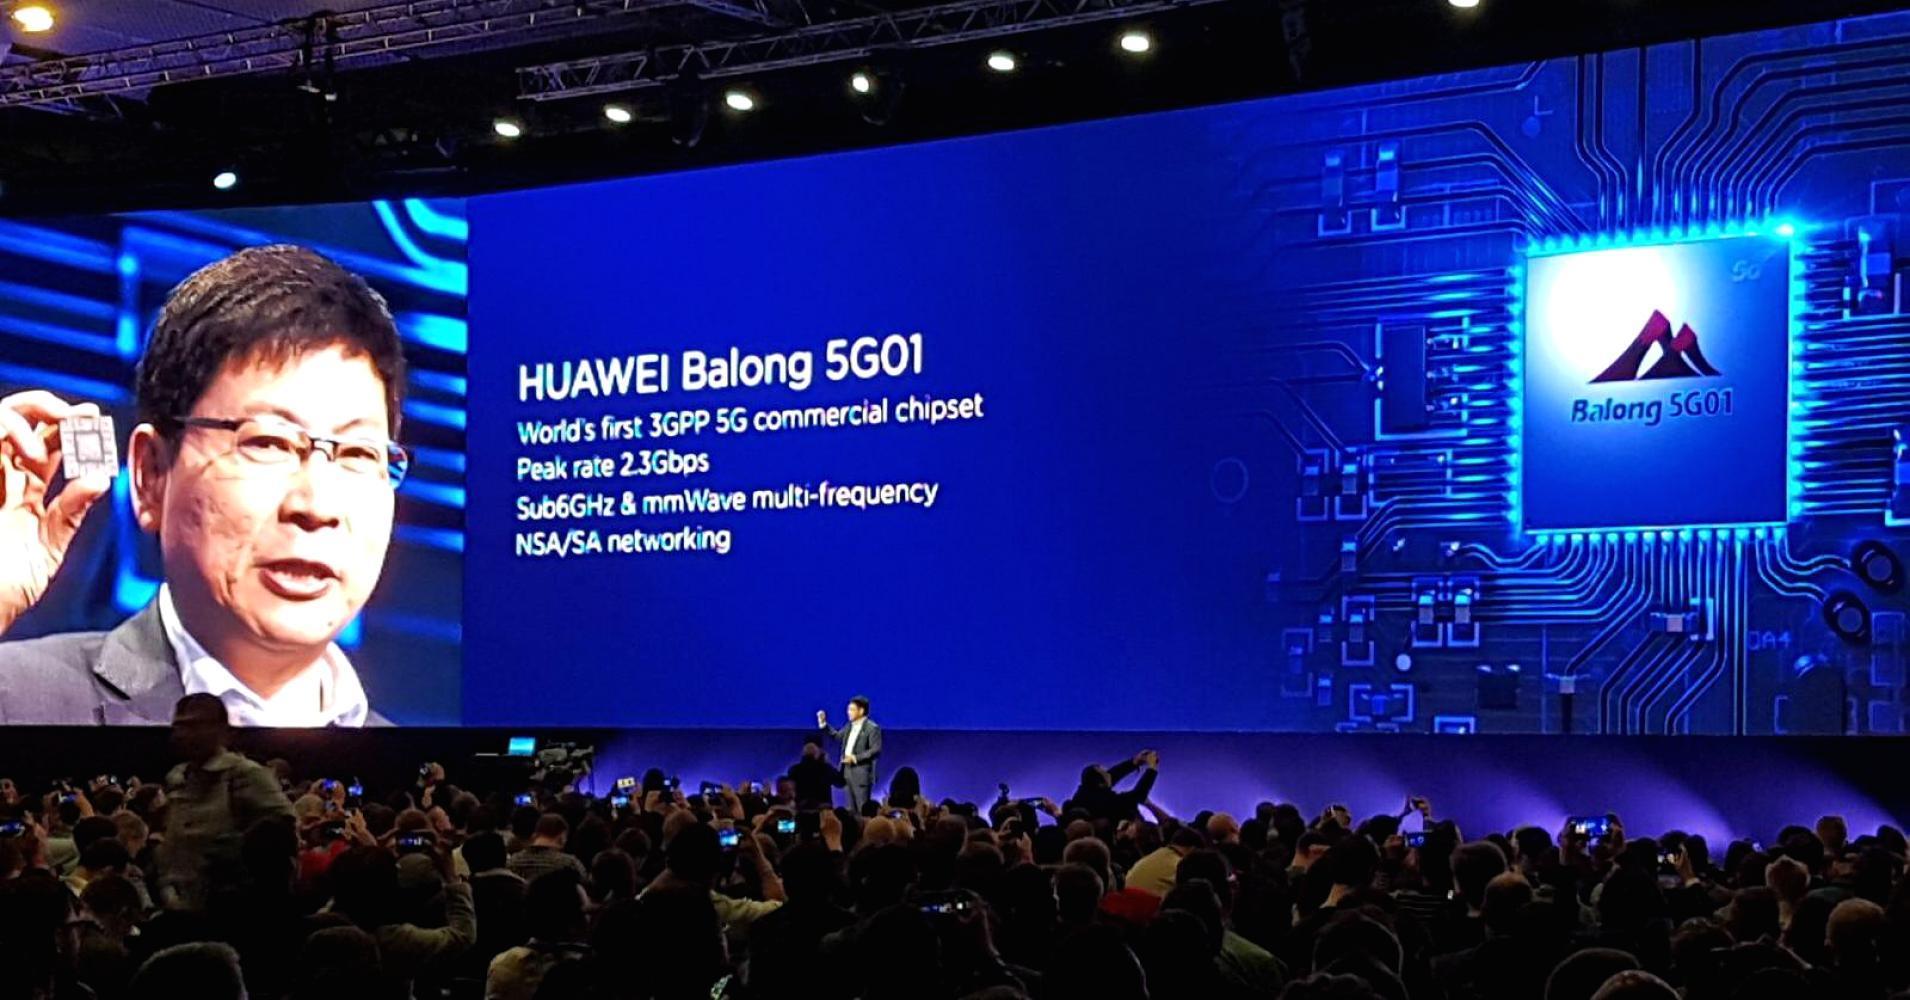 Huawei, la 'guerra' Usa-Cina, l'arresto di Meng Wanzhou. Il punto